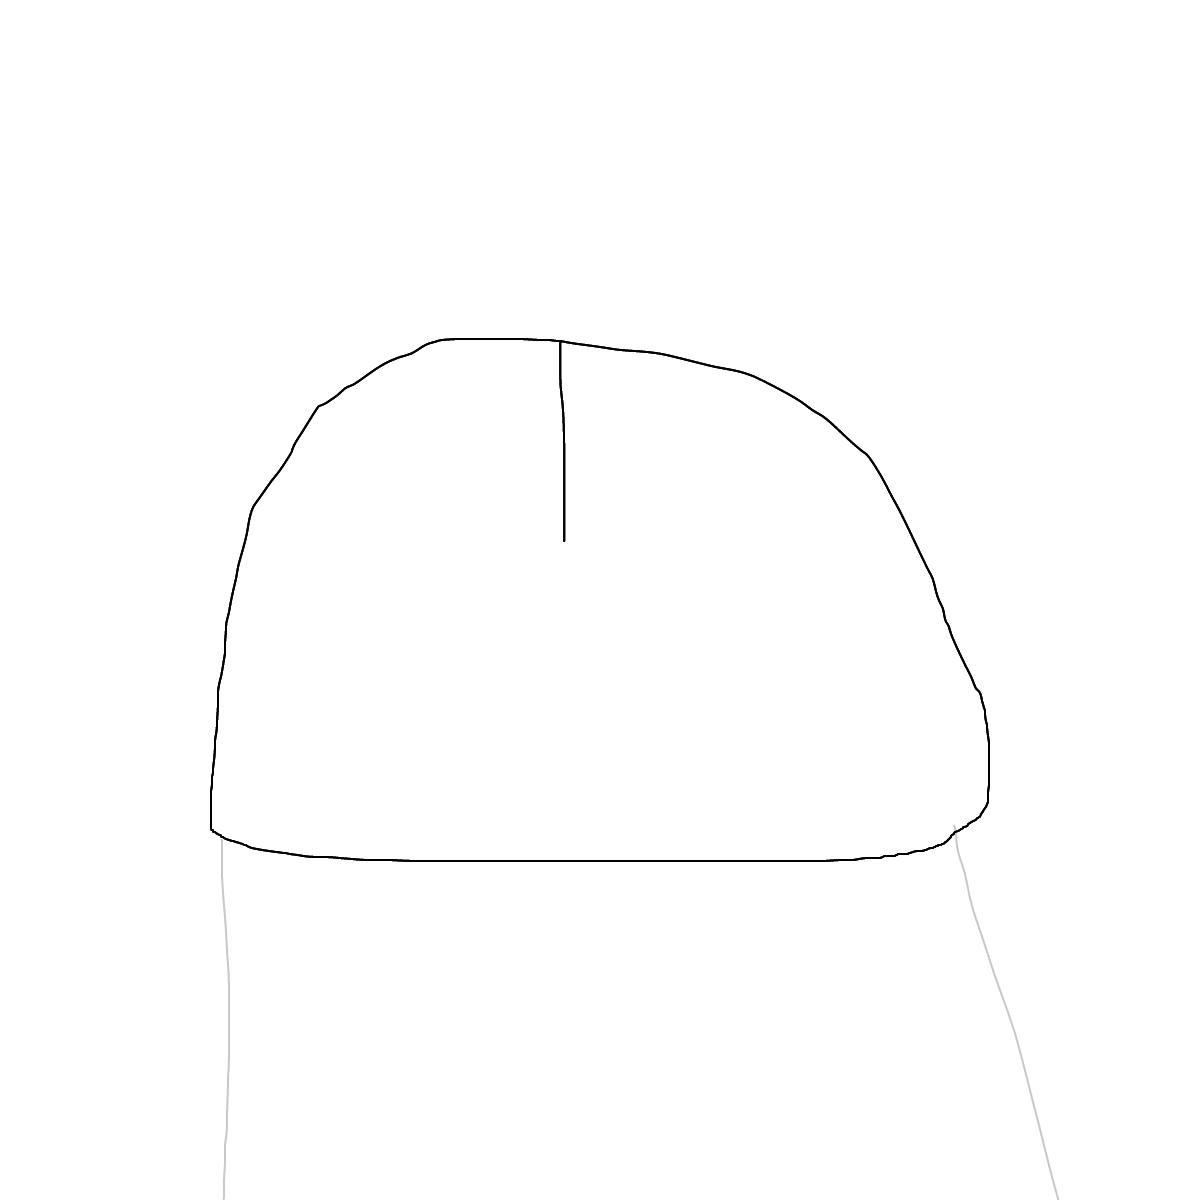 BAAAM drawing#19577 lat:40.4807739257812500lng: -74.0054855346679700